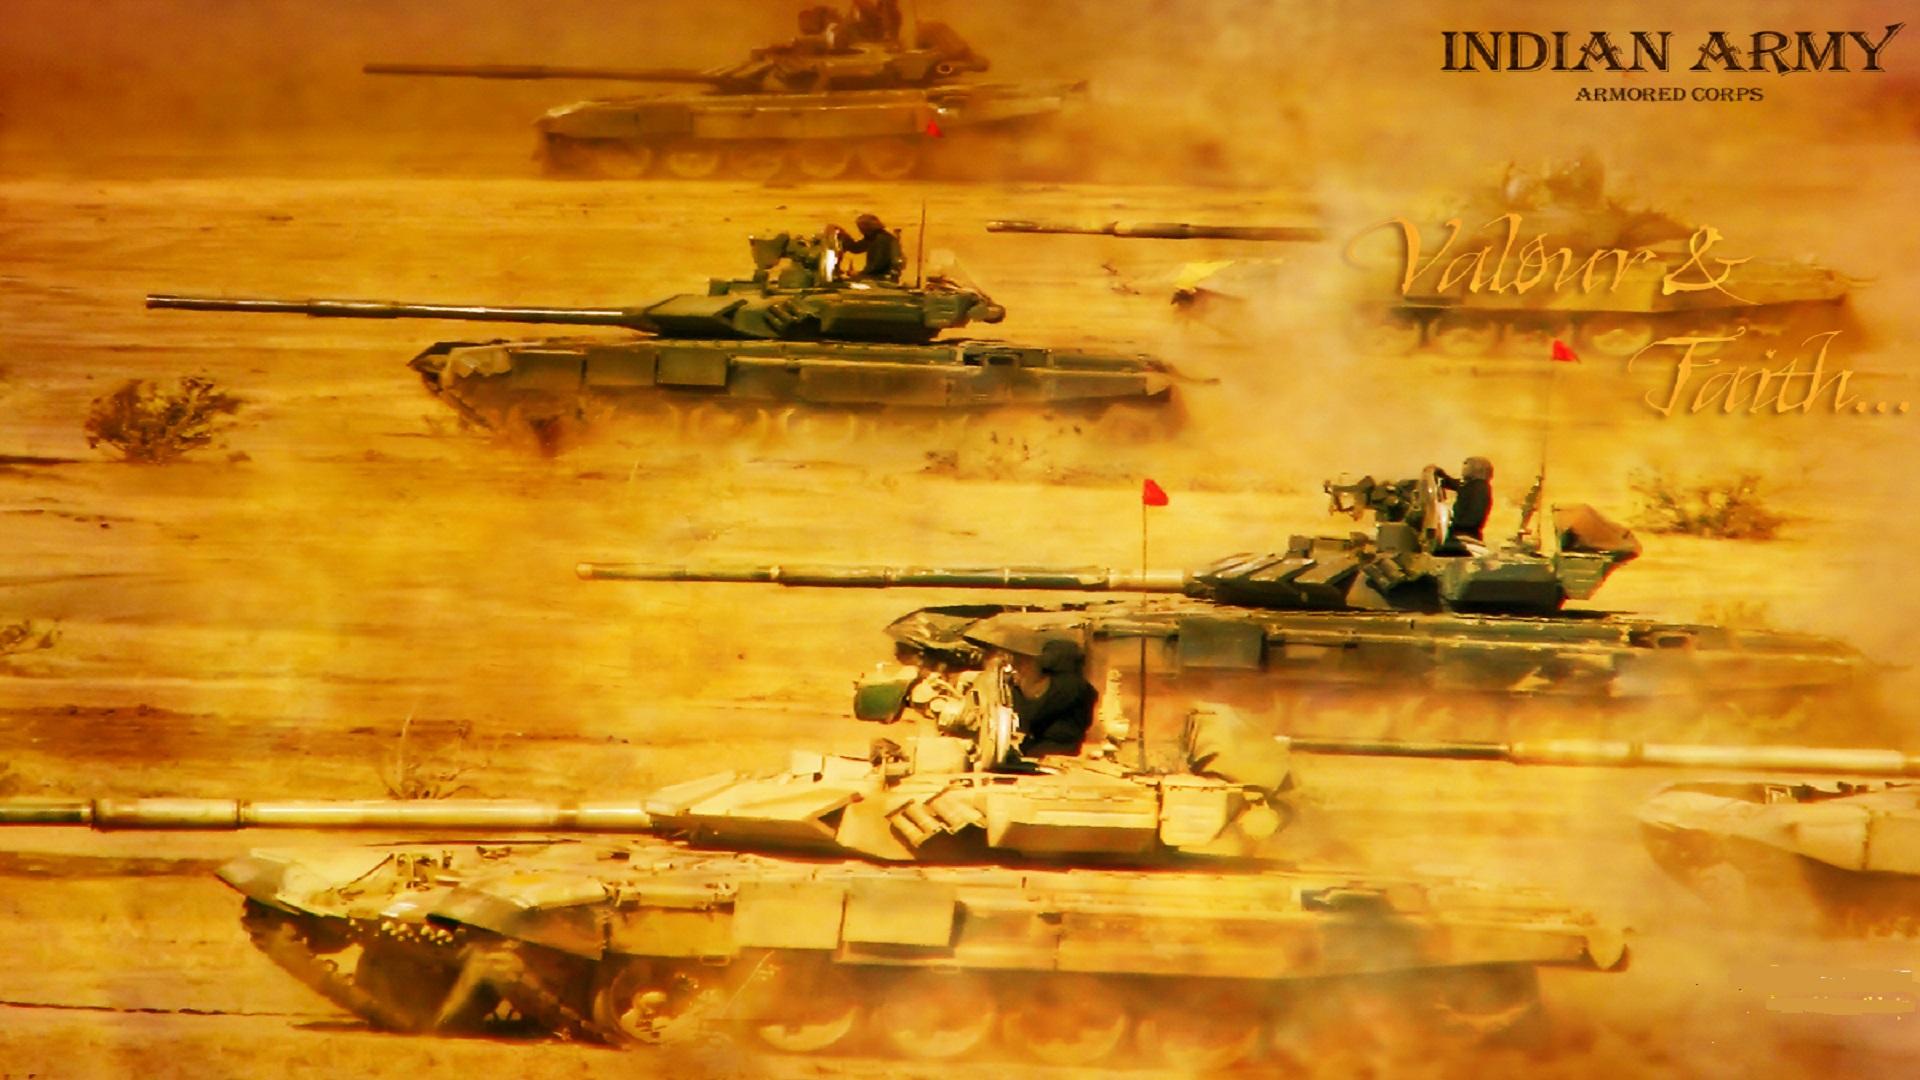 Hd wallpaper indian army - Add Media Report Rss Indian Tanks Wallpaper View Original